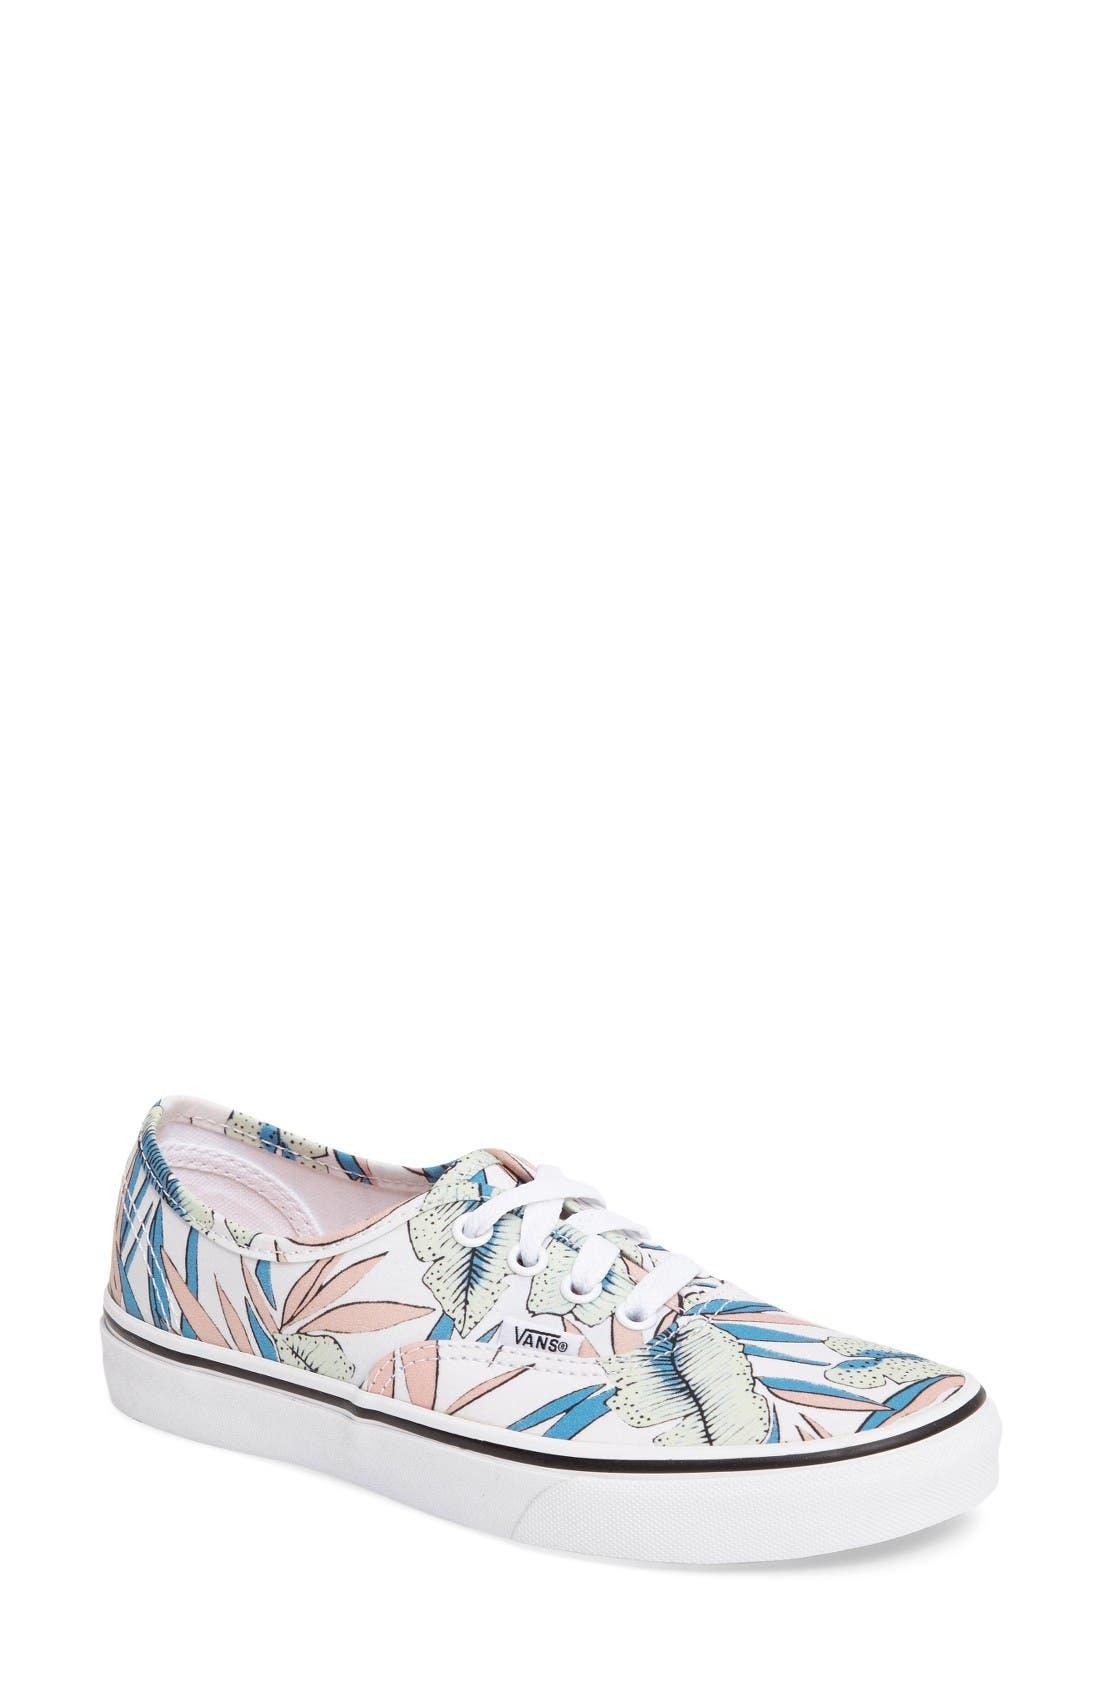 Alternate Image 1 Selected - Vans 'Authentic' Canvas Sneaker (Women)